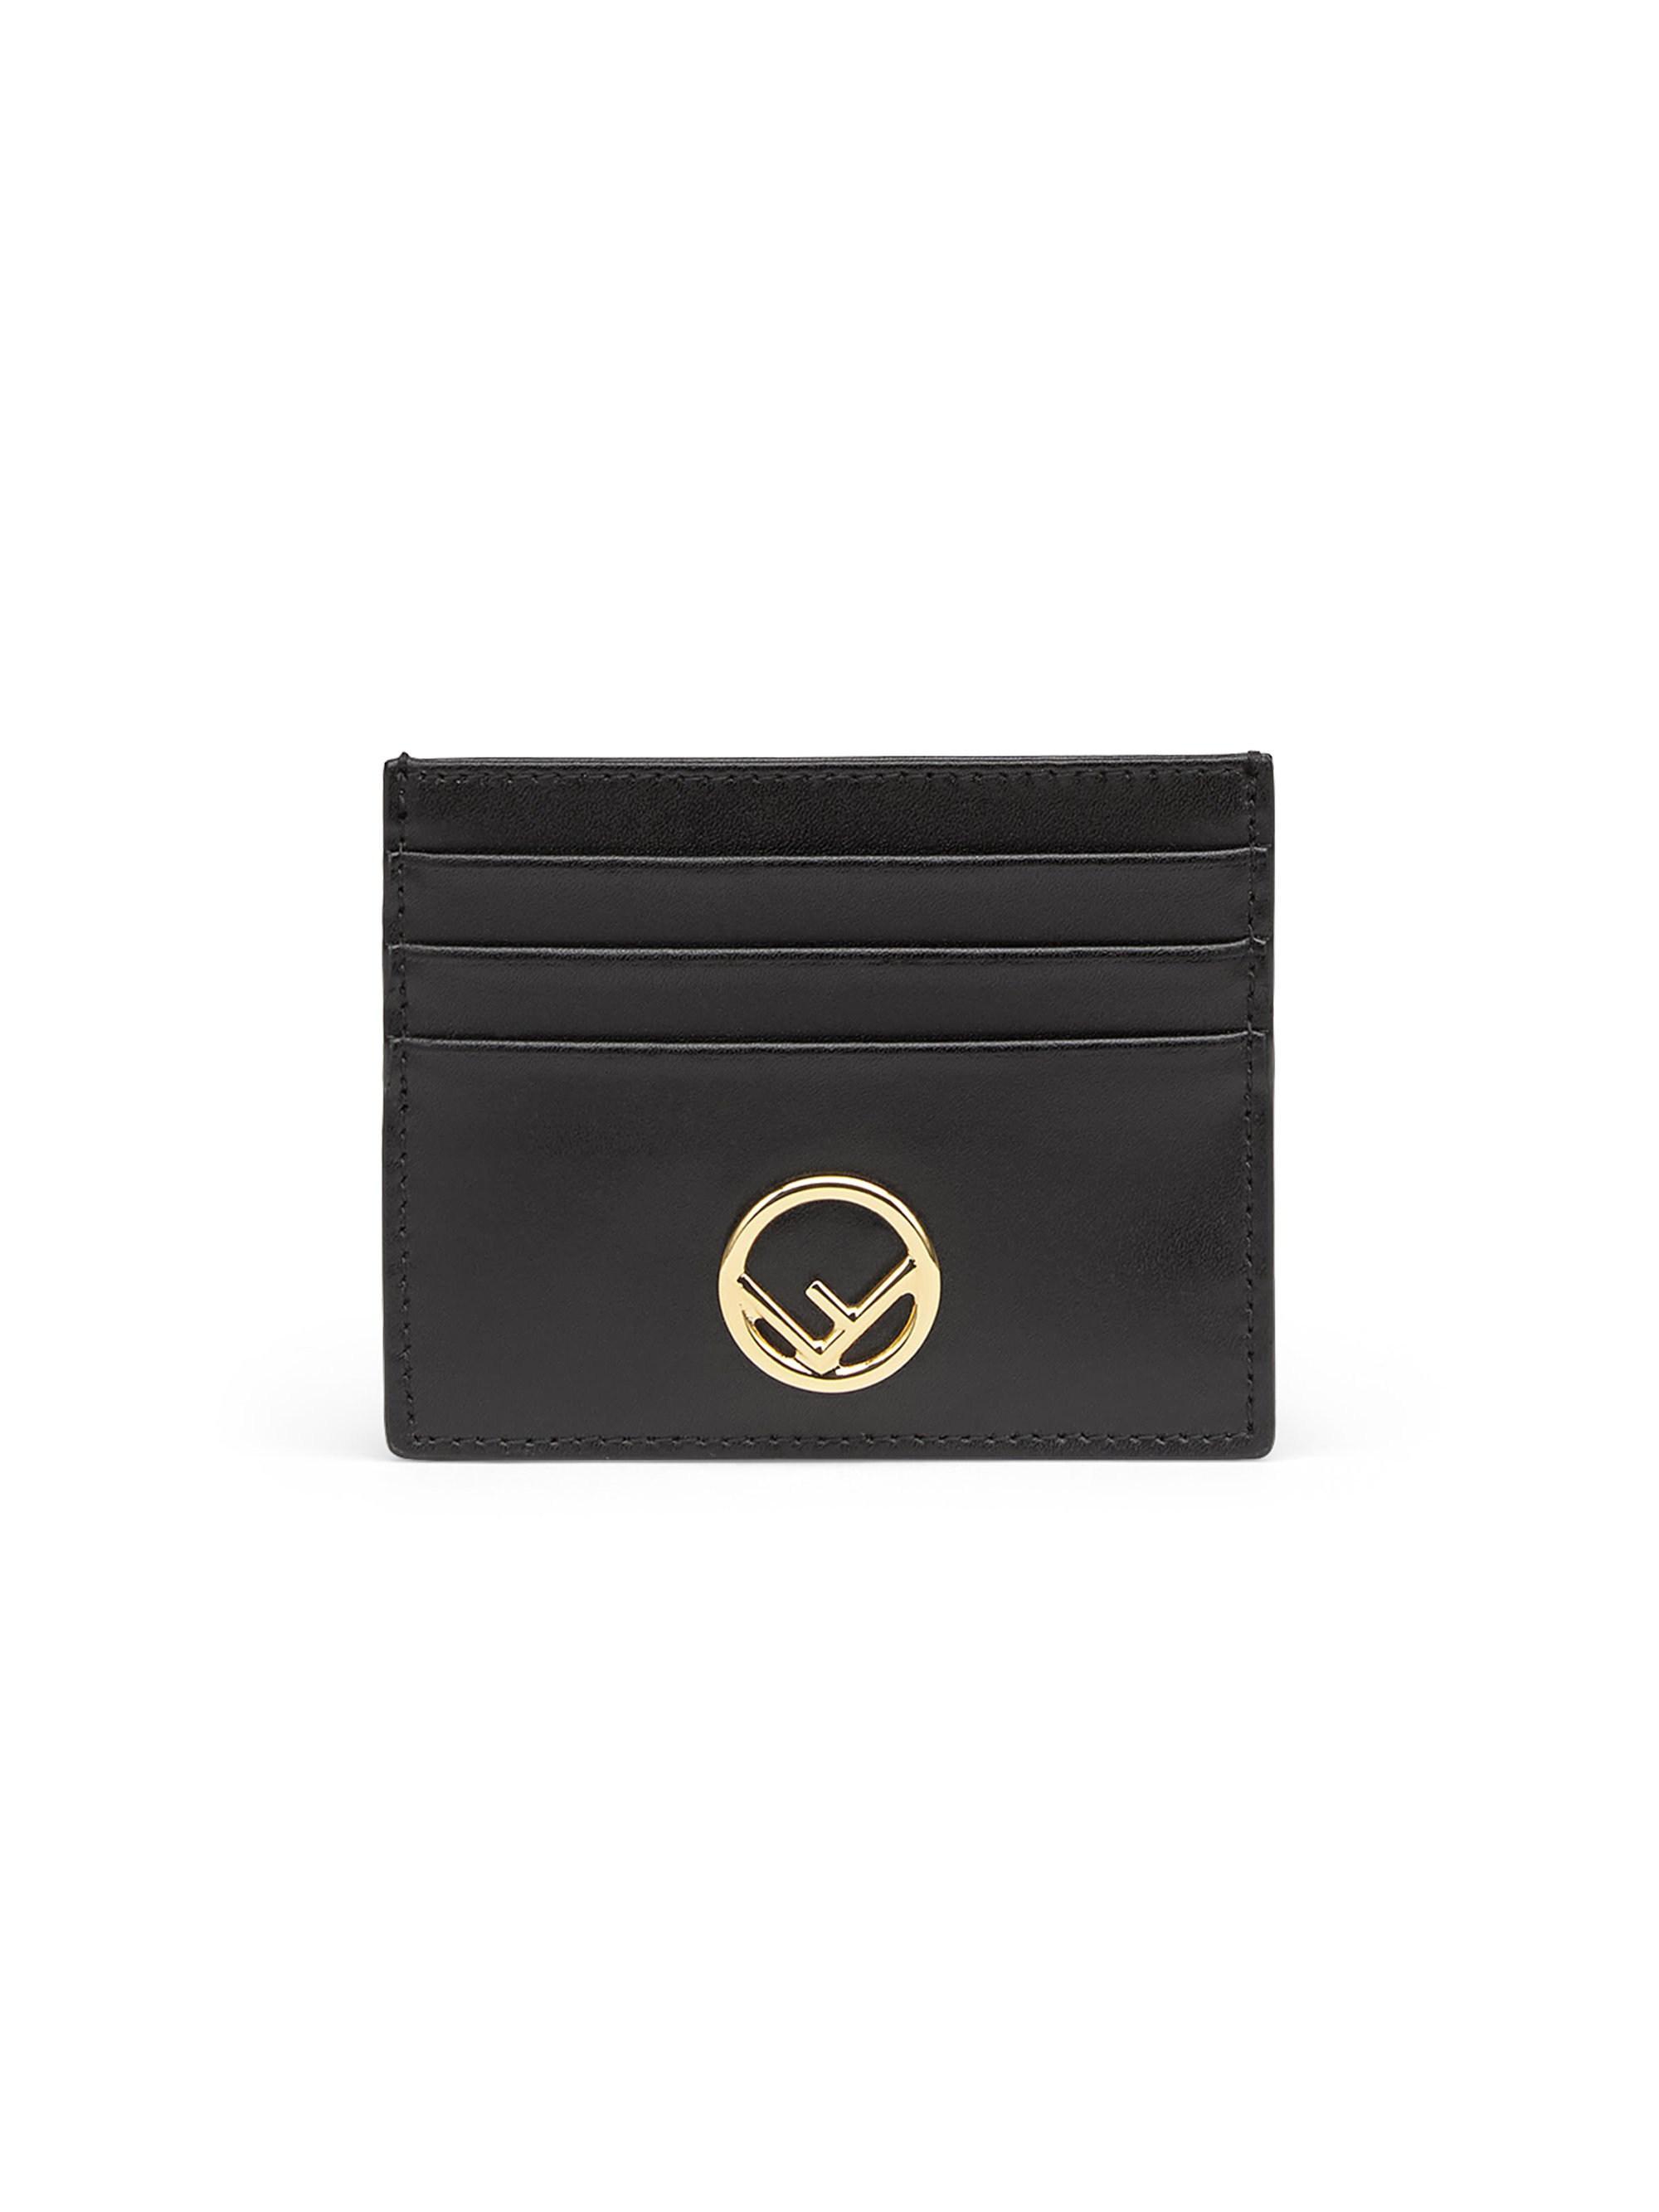 48c876e4 Lyst - Fendi Women's Ff Leather Card Case - Black in Black - Save 26%